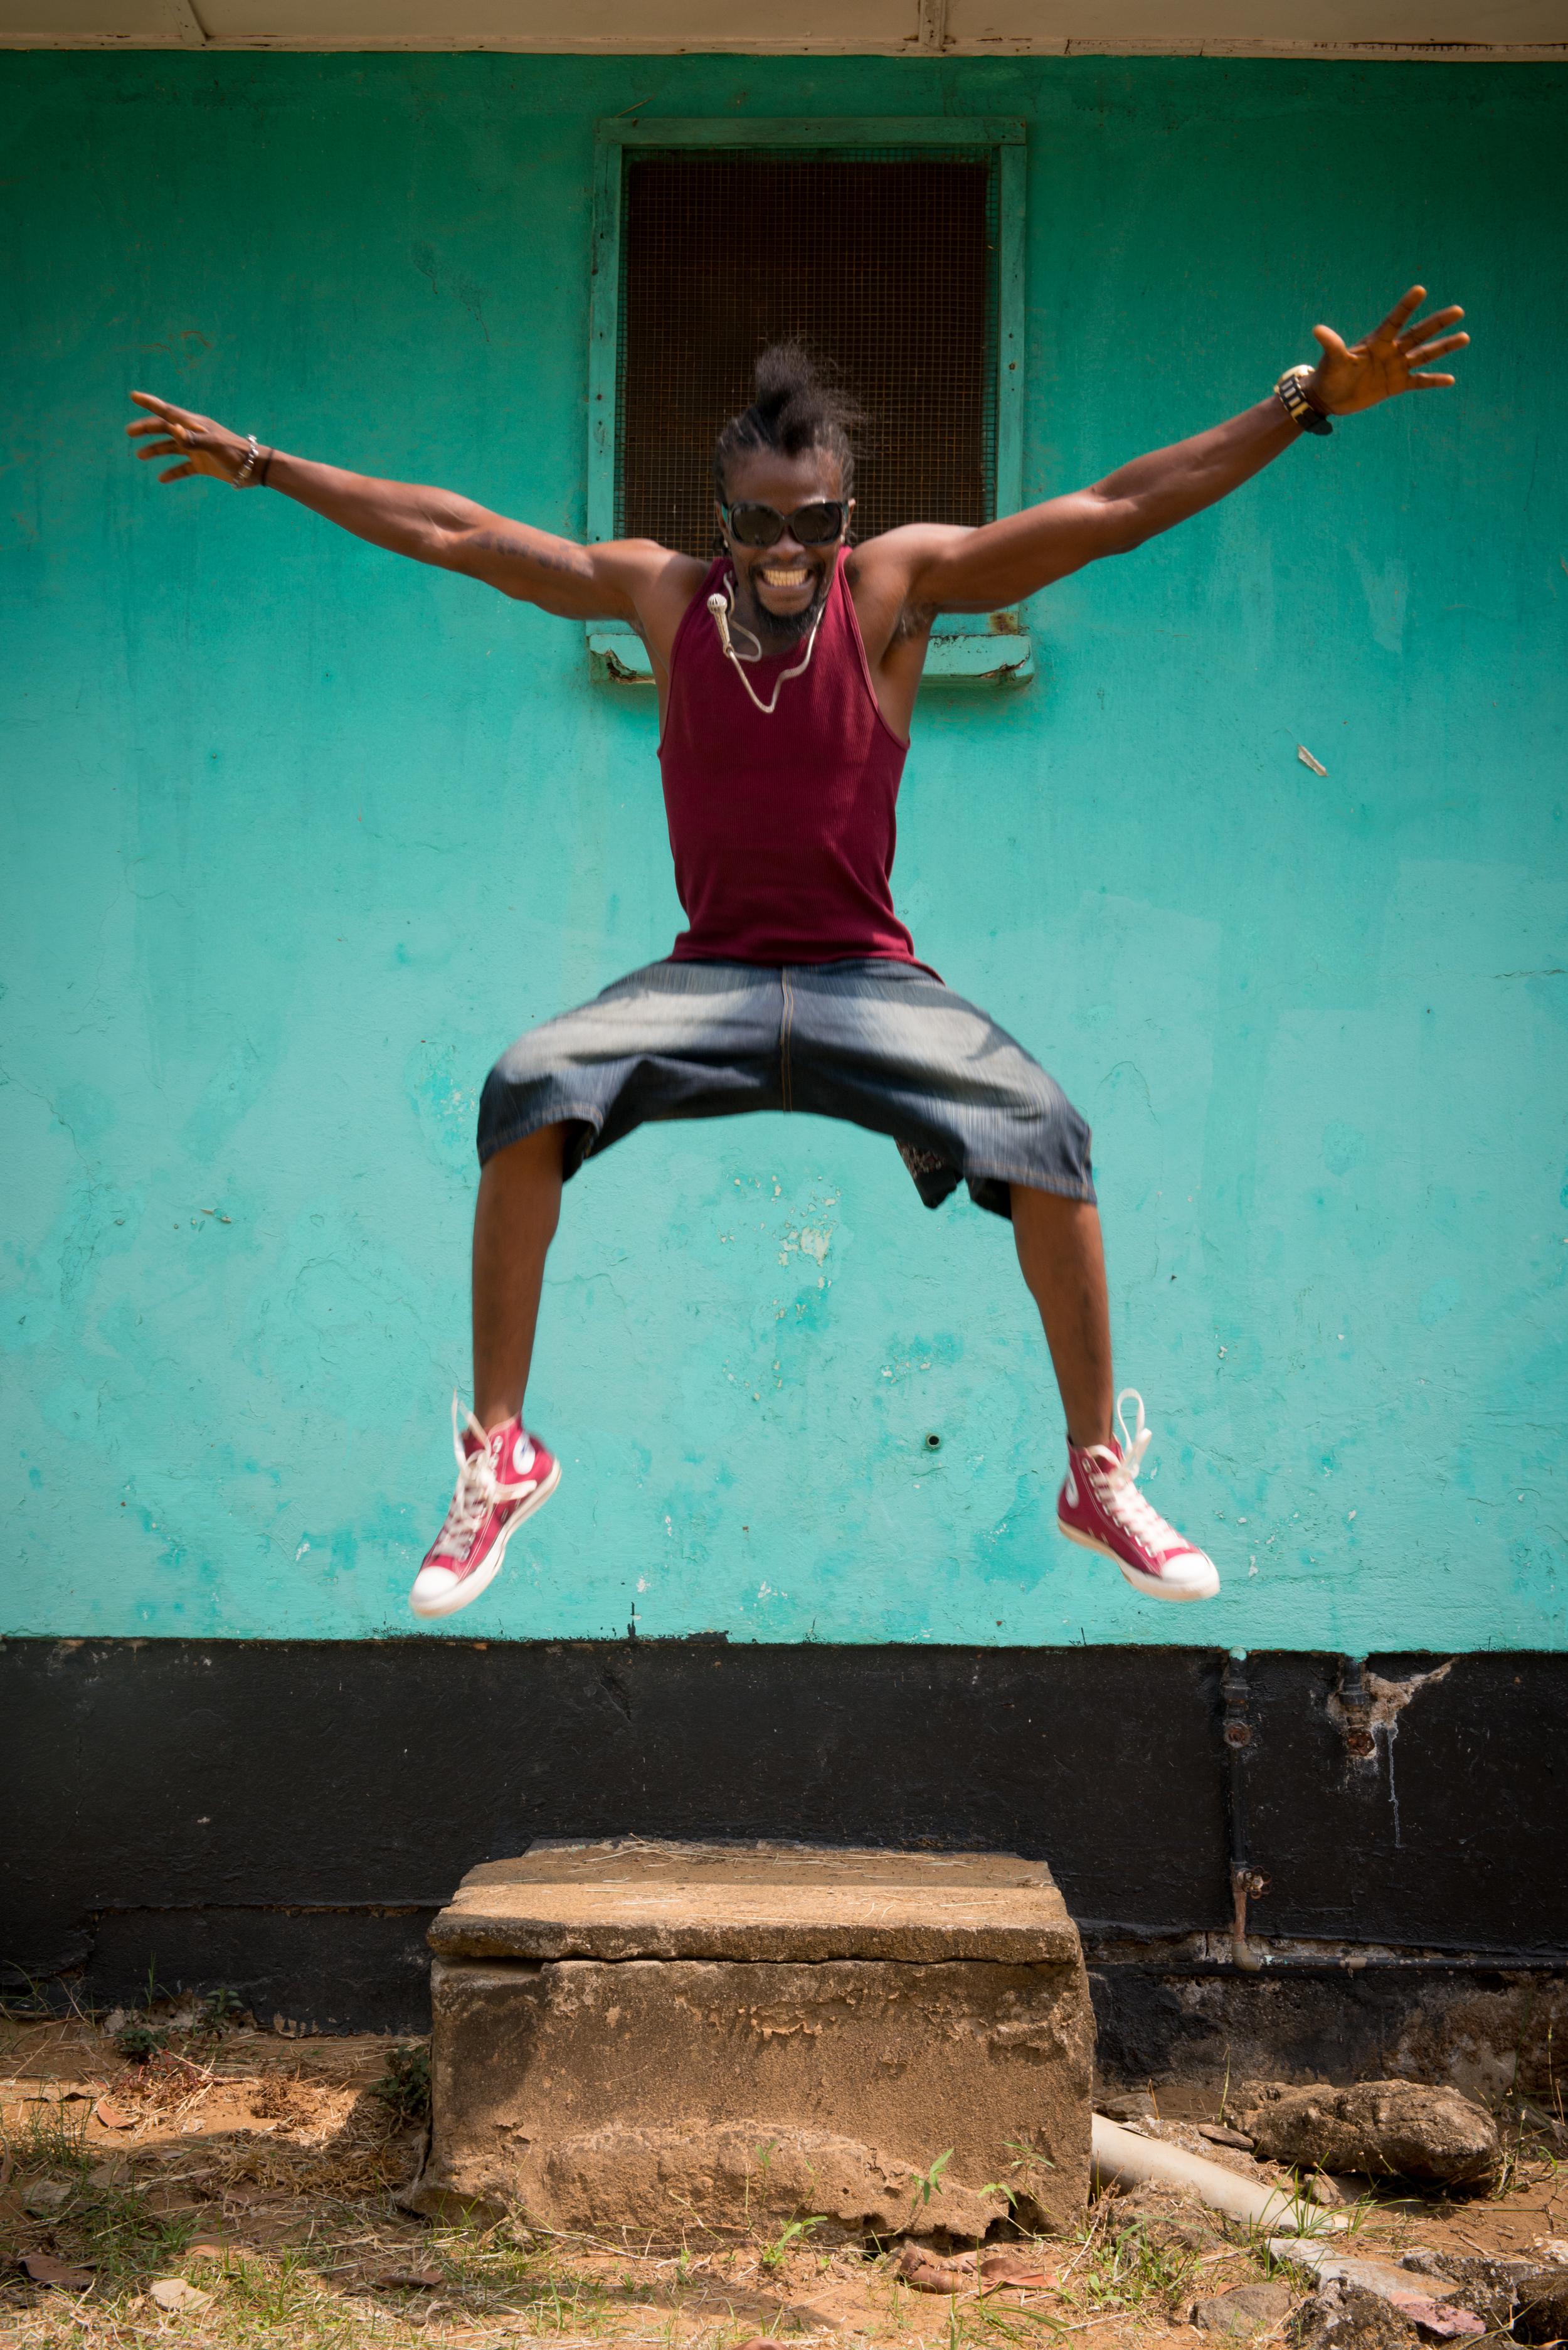 takun-j-hip-co-king-jump-by-ken-harper.jpg